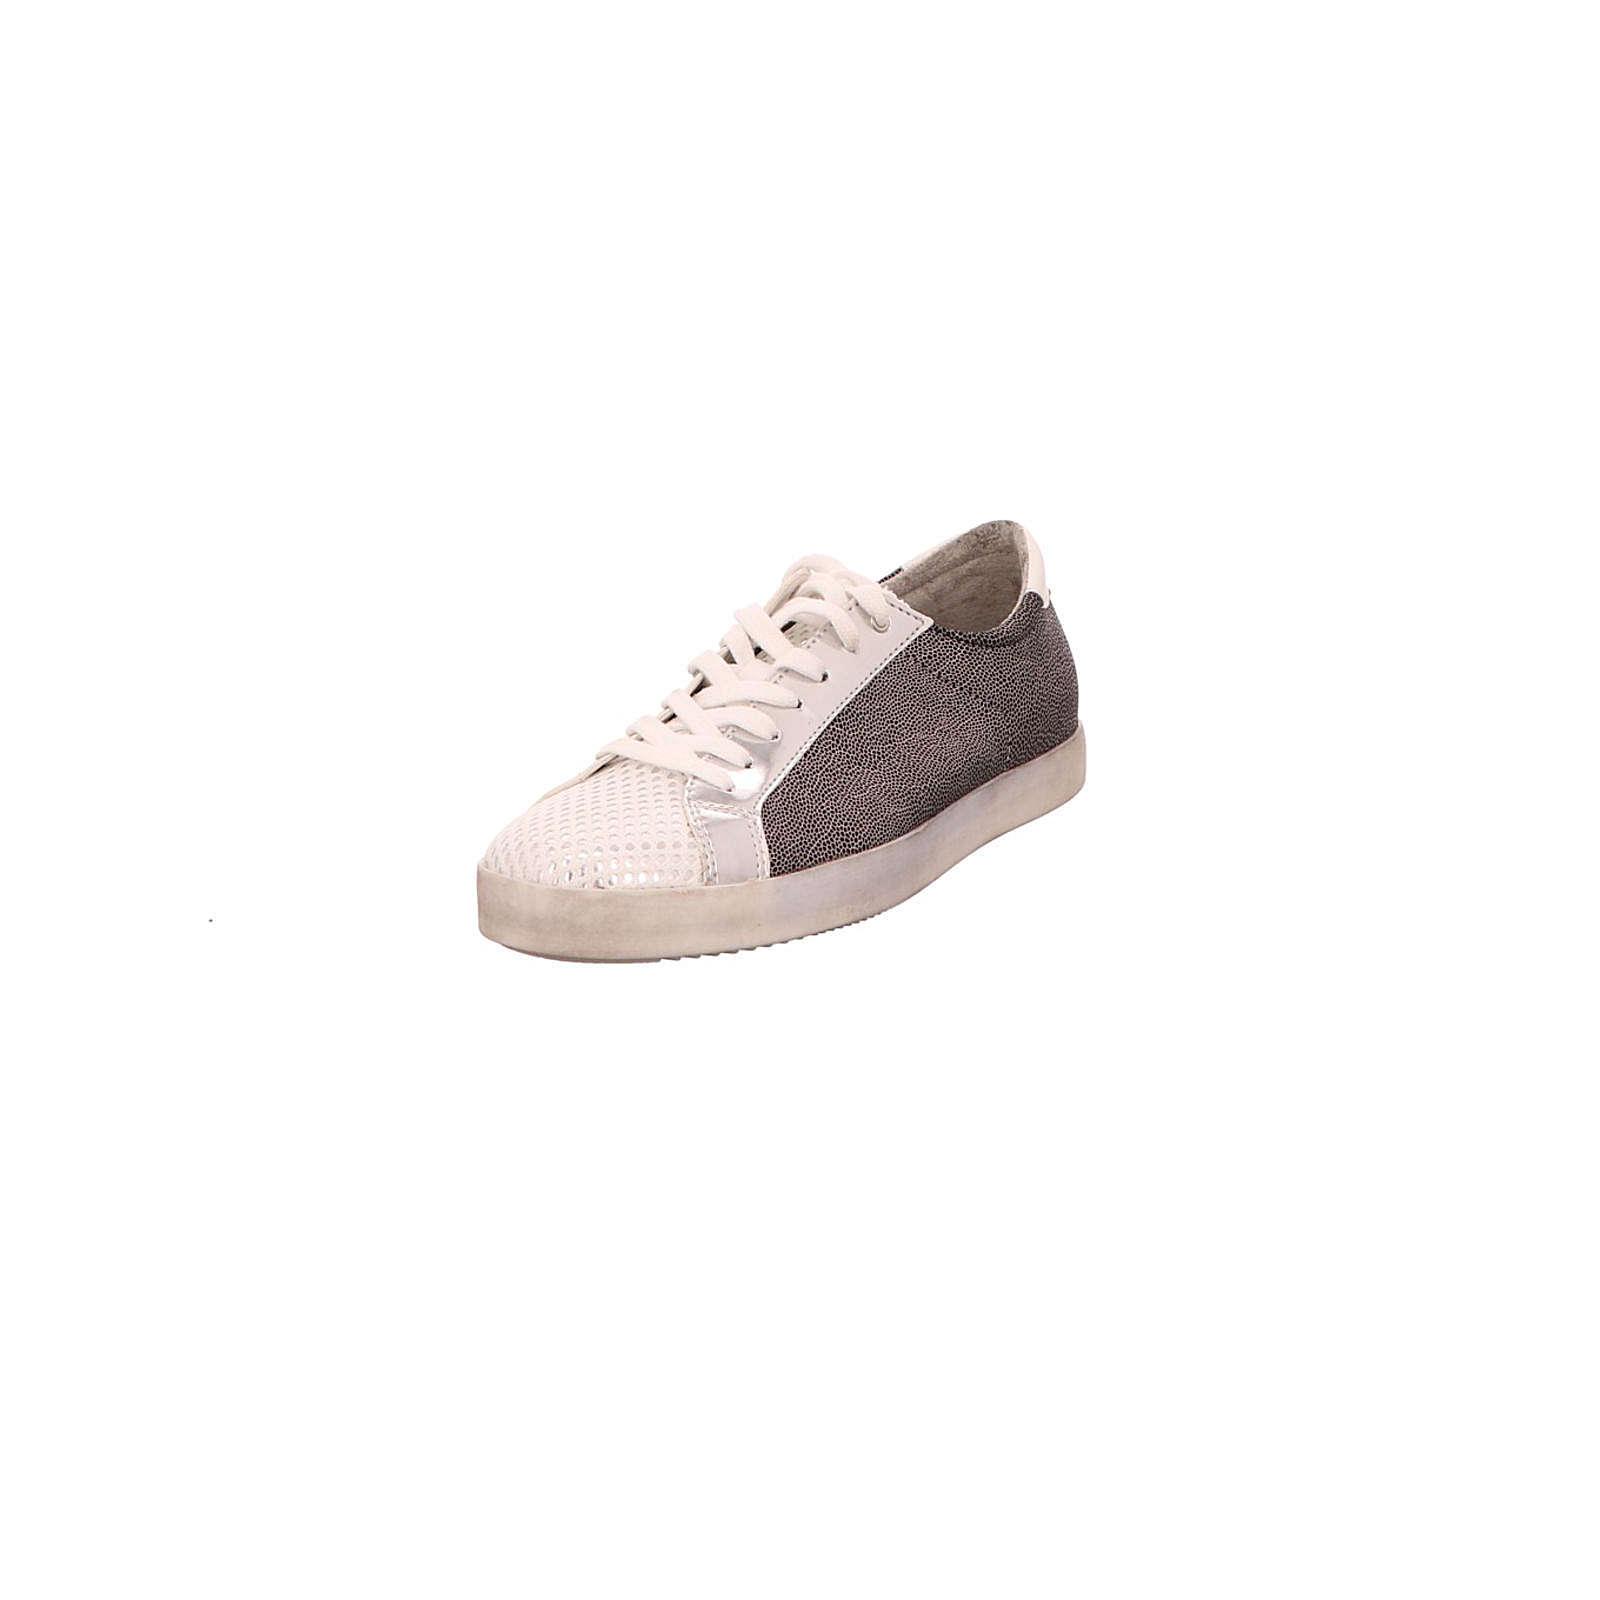 Tamaris Sneakers weiß weiß Damen Gr. 39